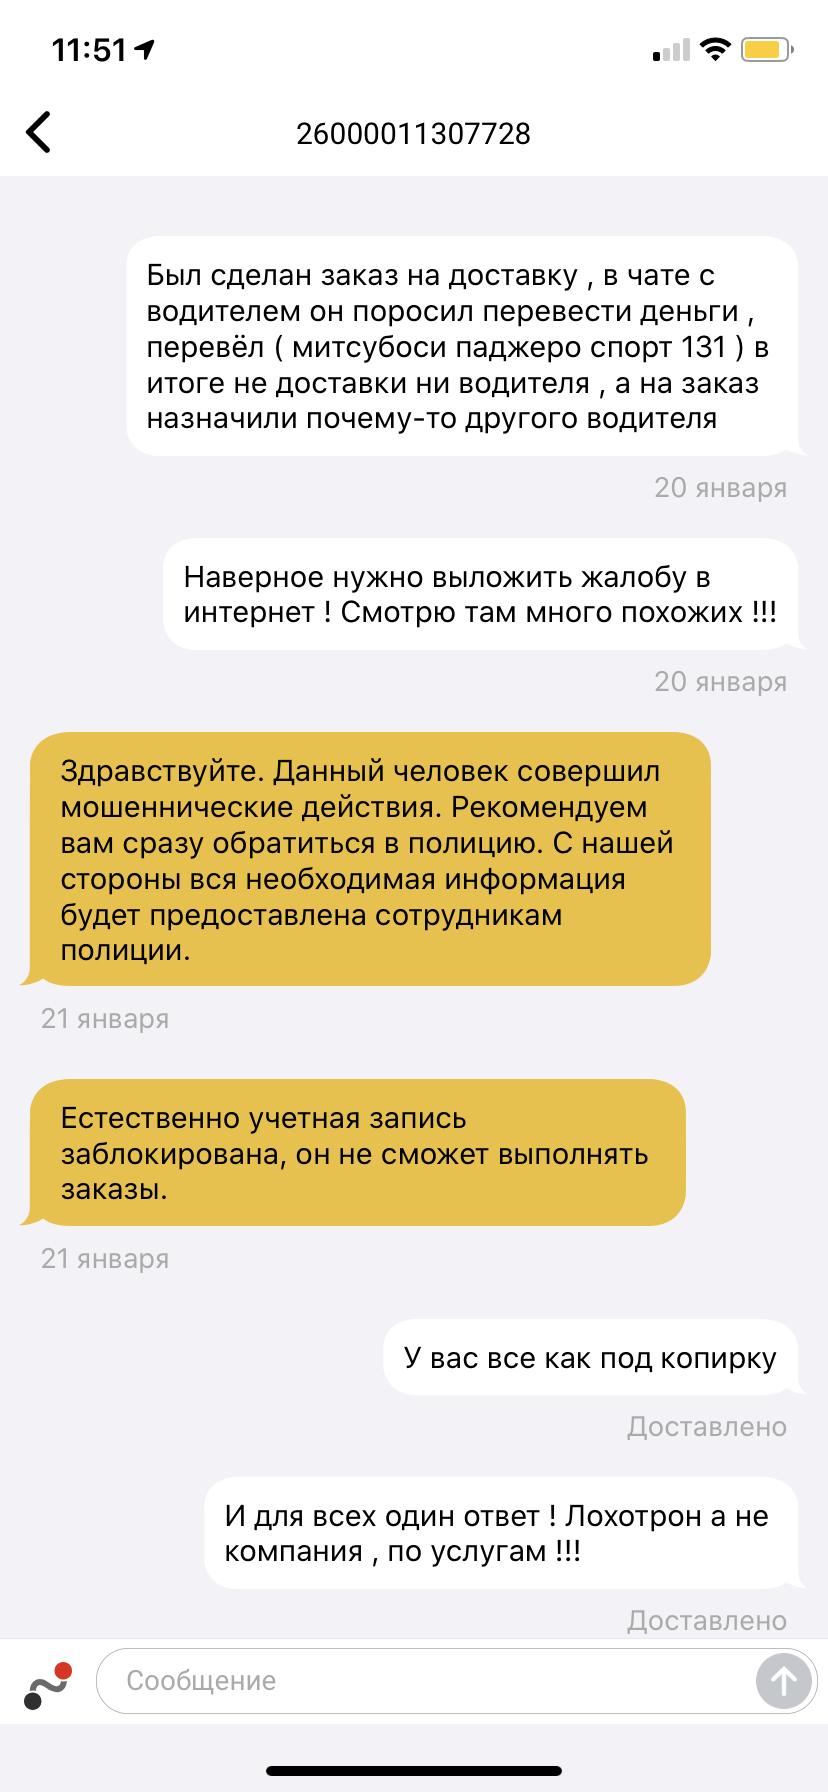 Taxi-Maxim - Лохотрон Некогда не заказывайте тут доставку